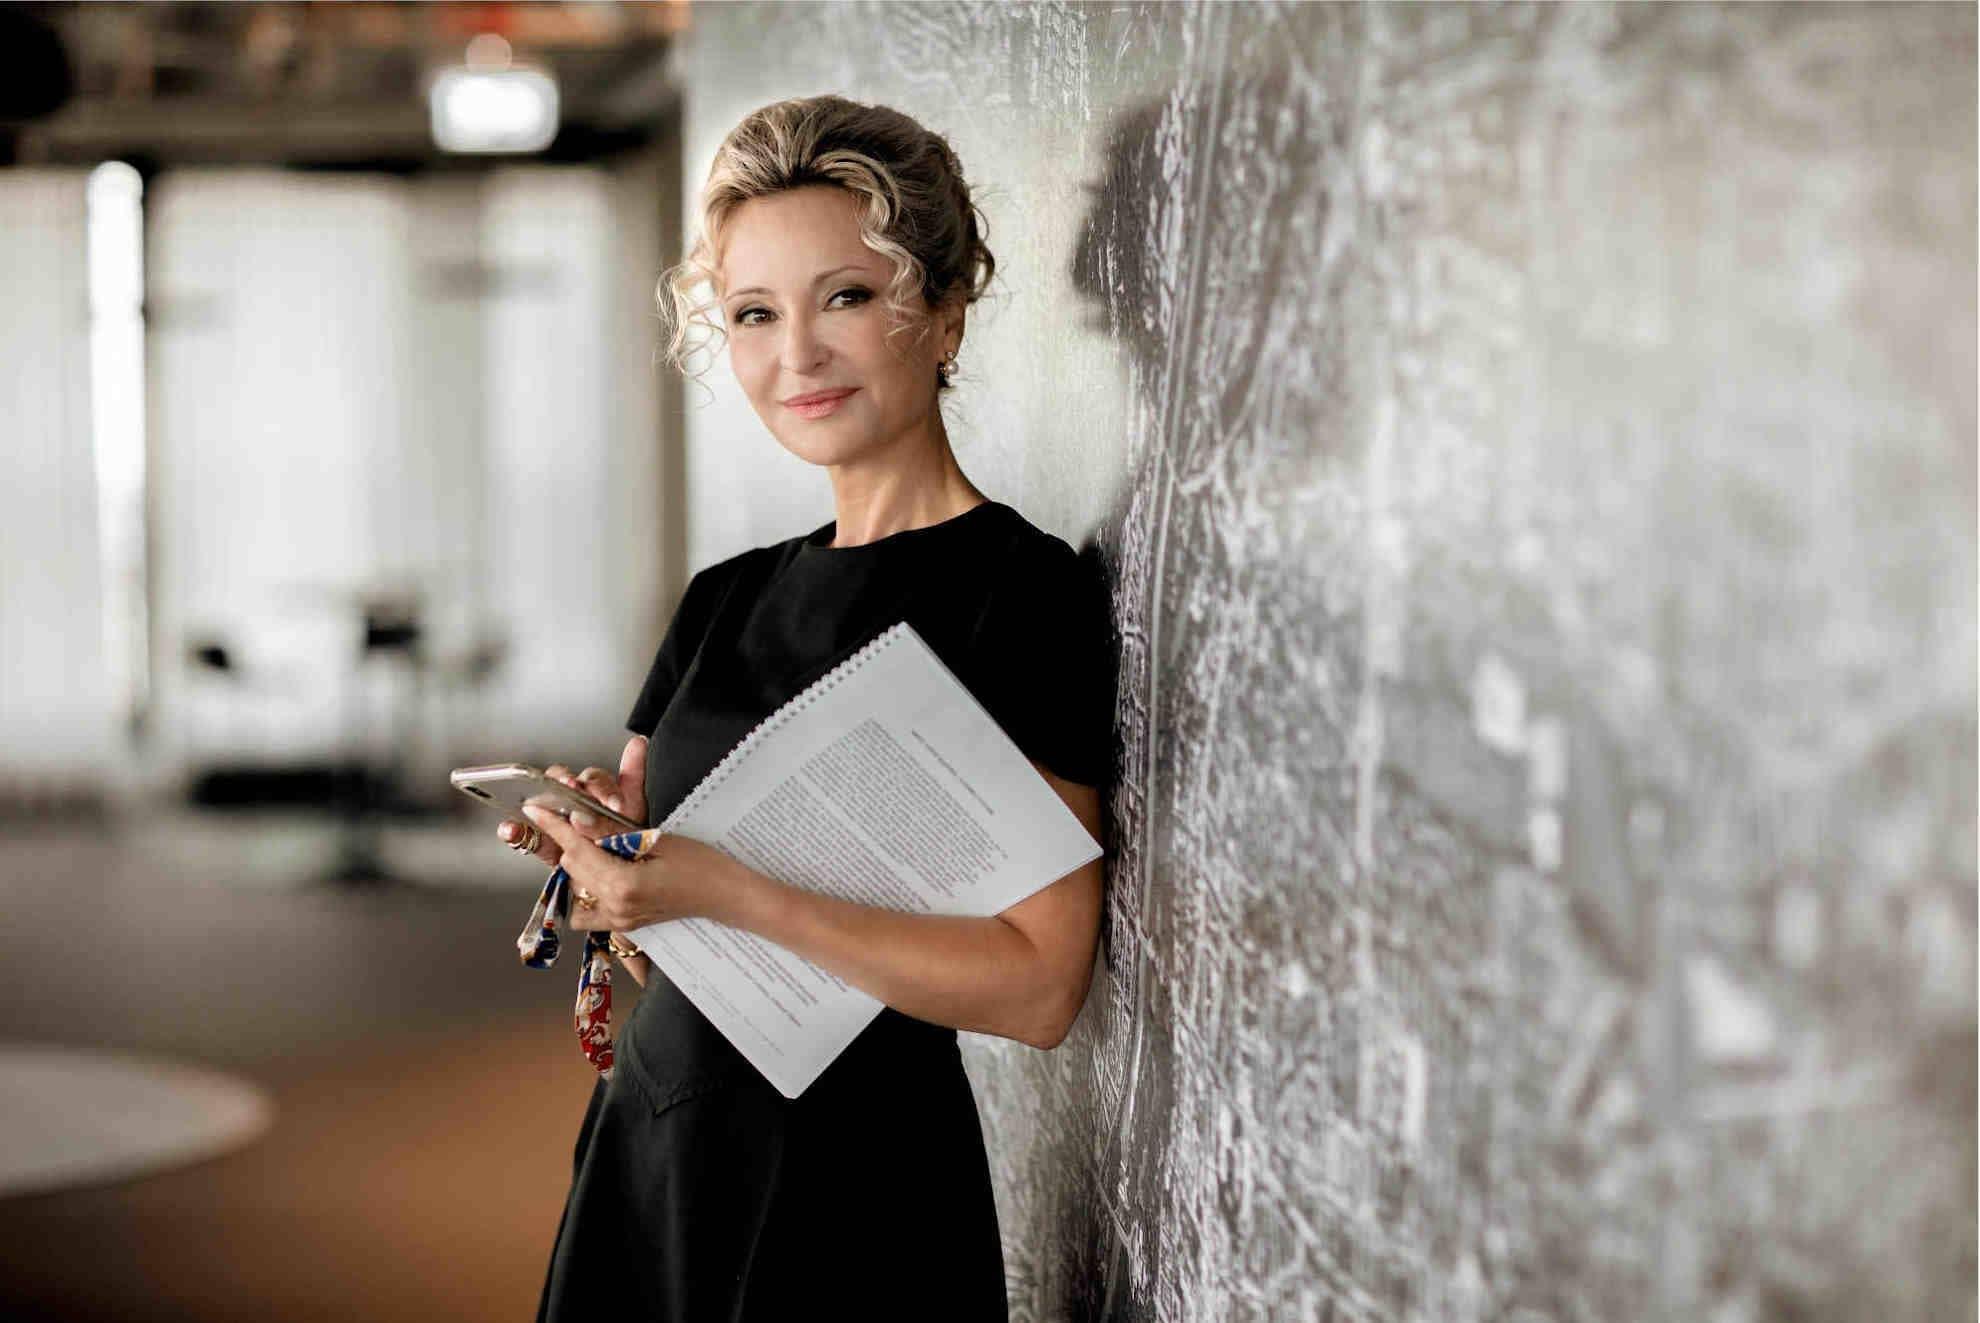 Sandra Navidi: Wie die Digitalisierung die Arbeitswelt verändert